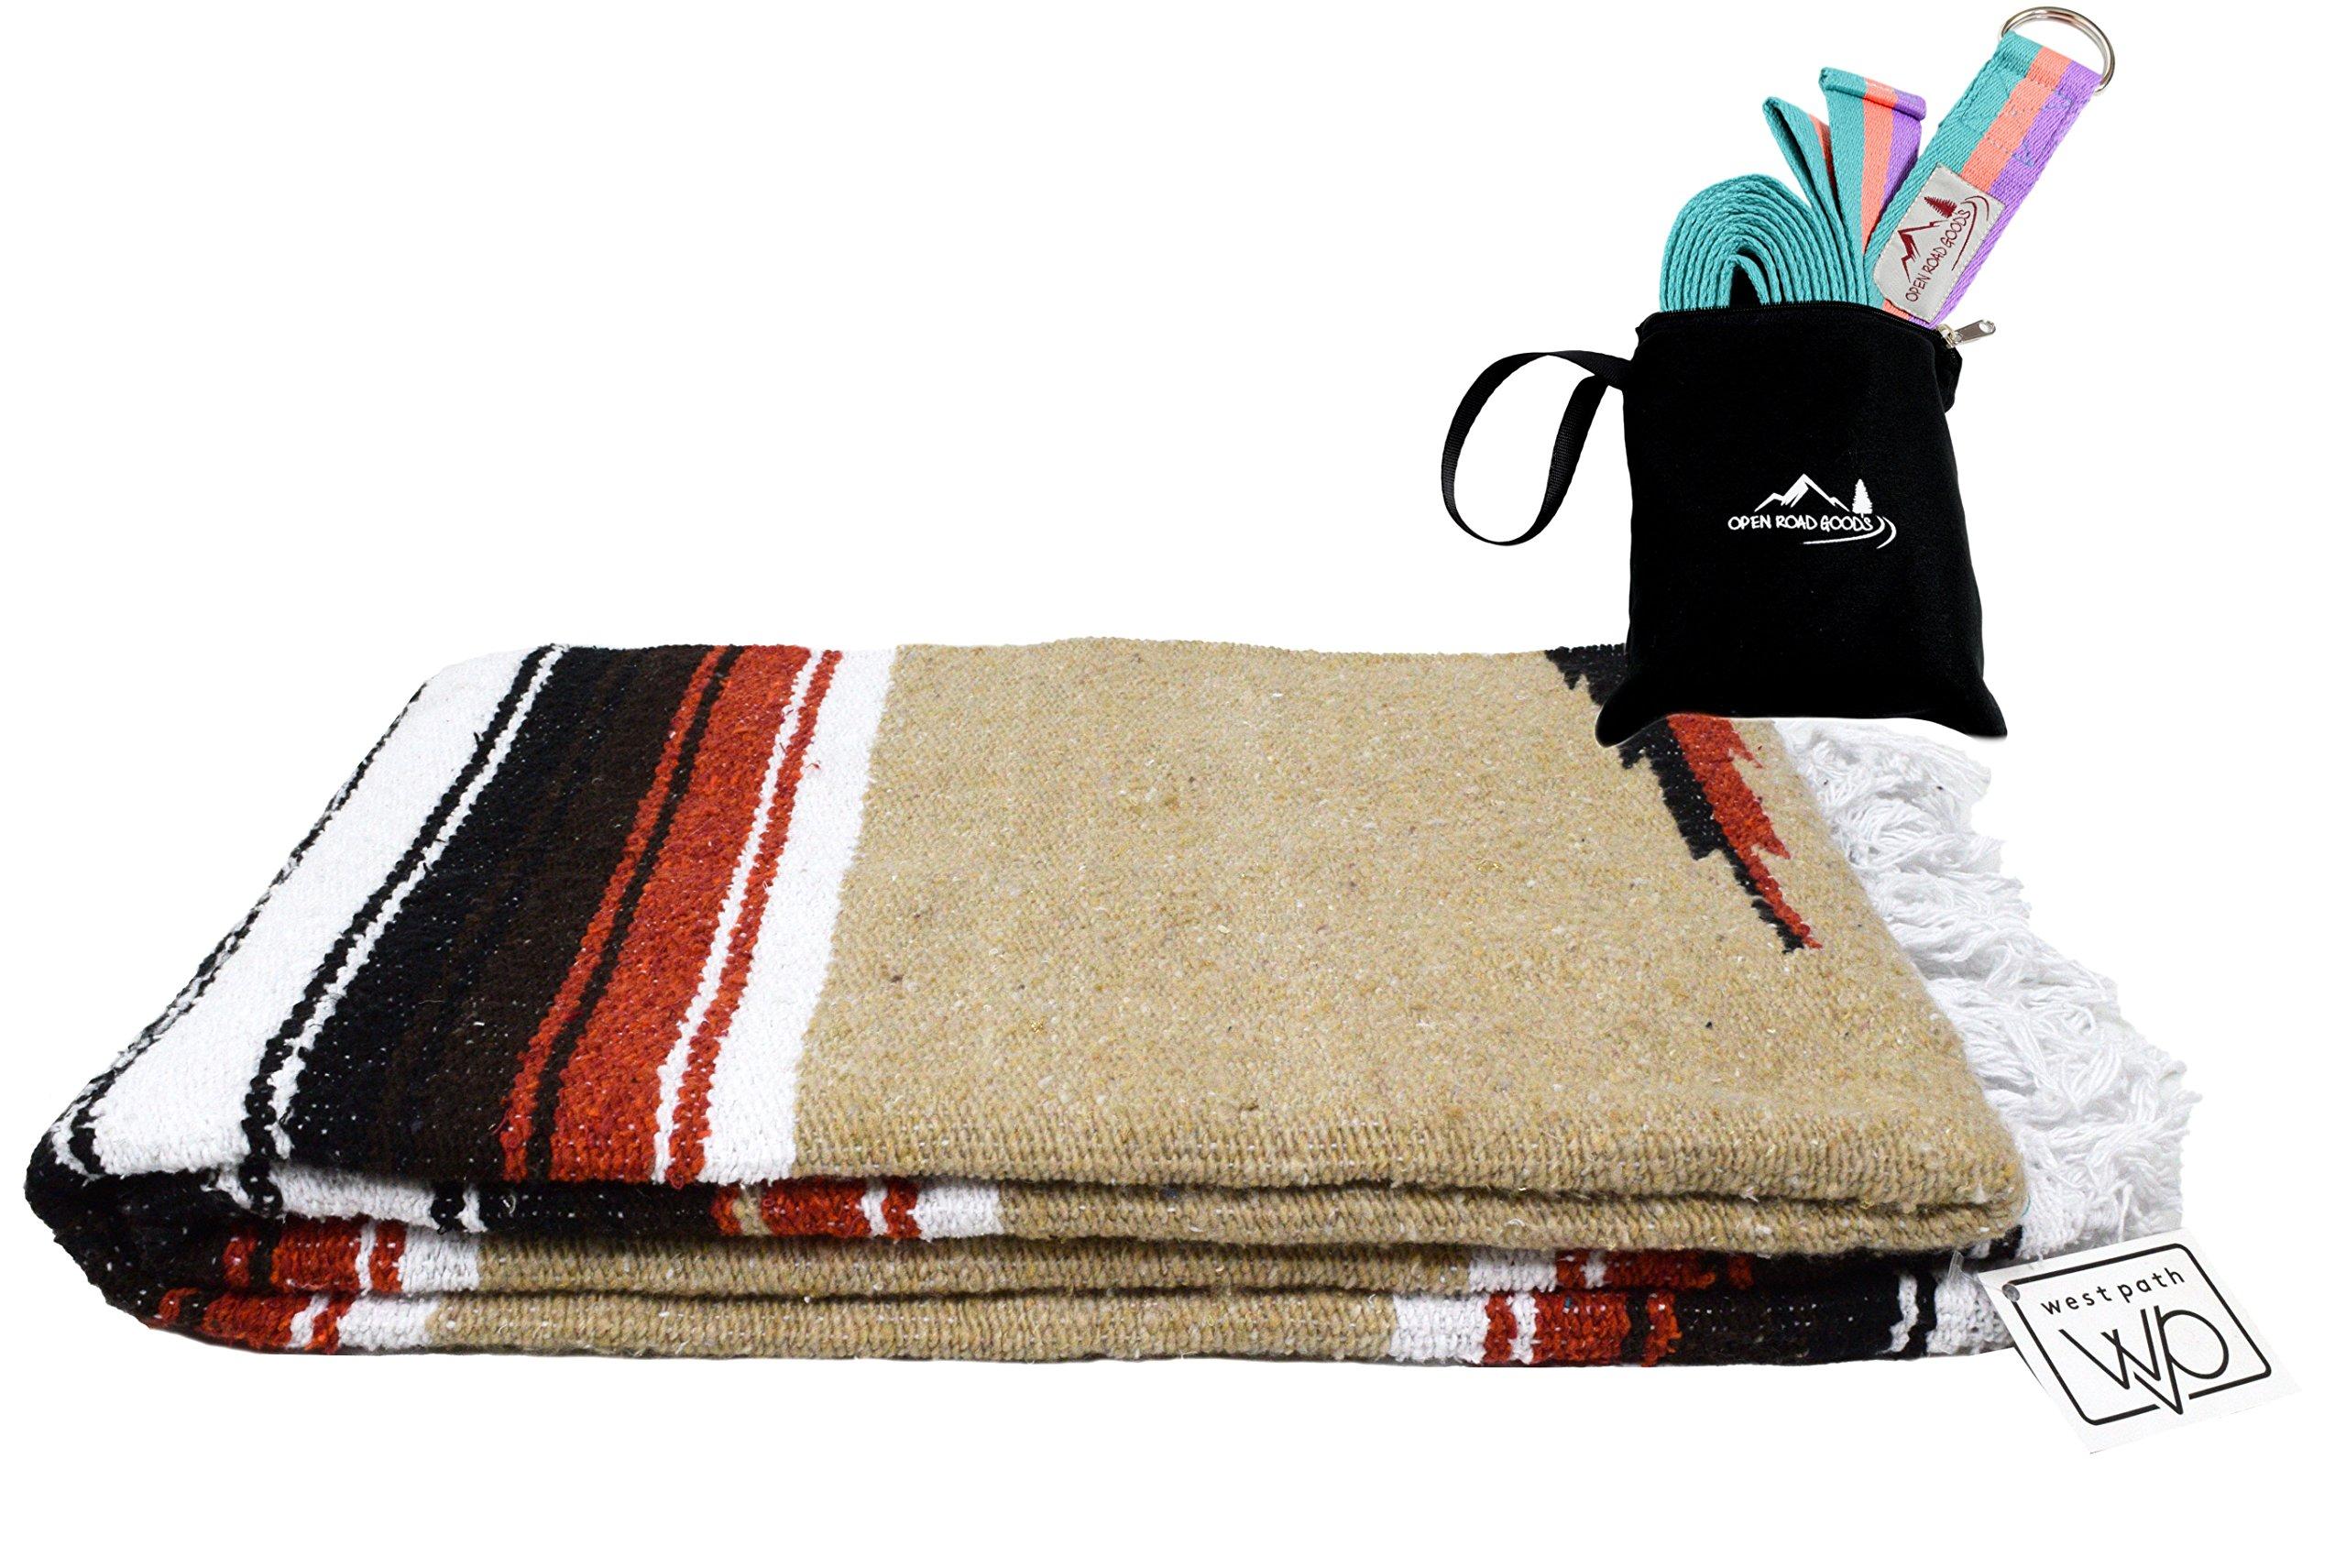 Tan/Khaki Mexican Yoga Blanket - Thick Navajo Diamond Serape with Orange & Brown Stripes - with Teal Coral Pastel Purple XL 8ft Yoga Strap